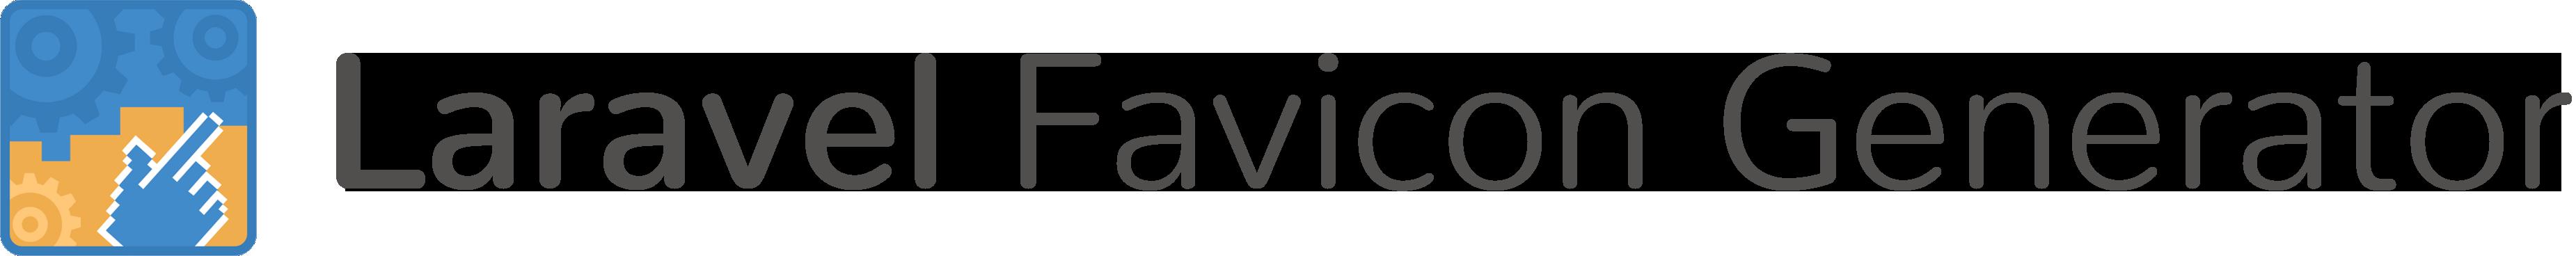 Laravel Favicon Generator